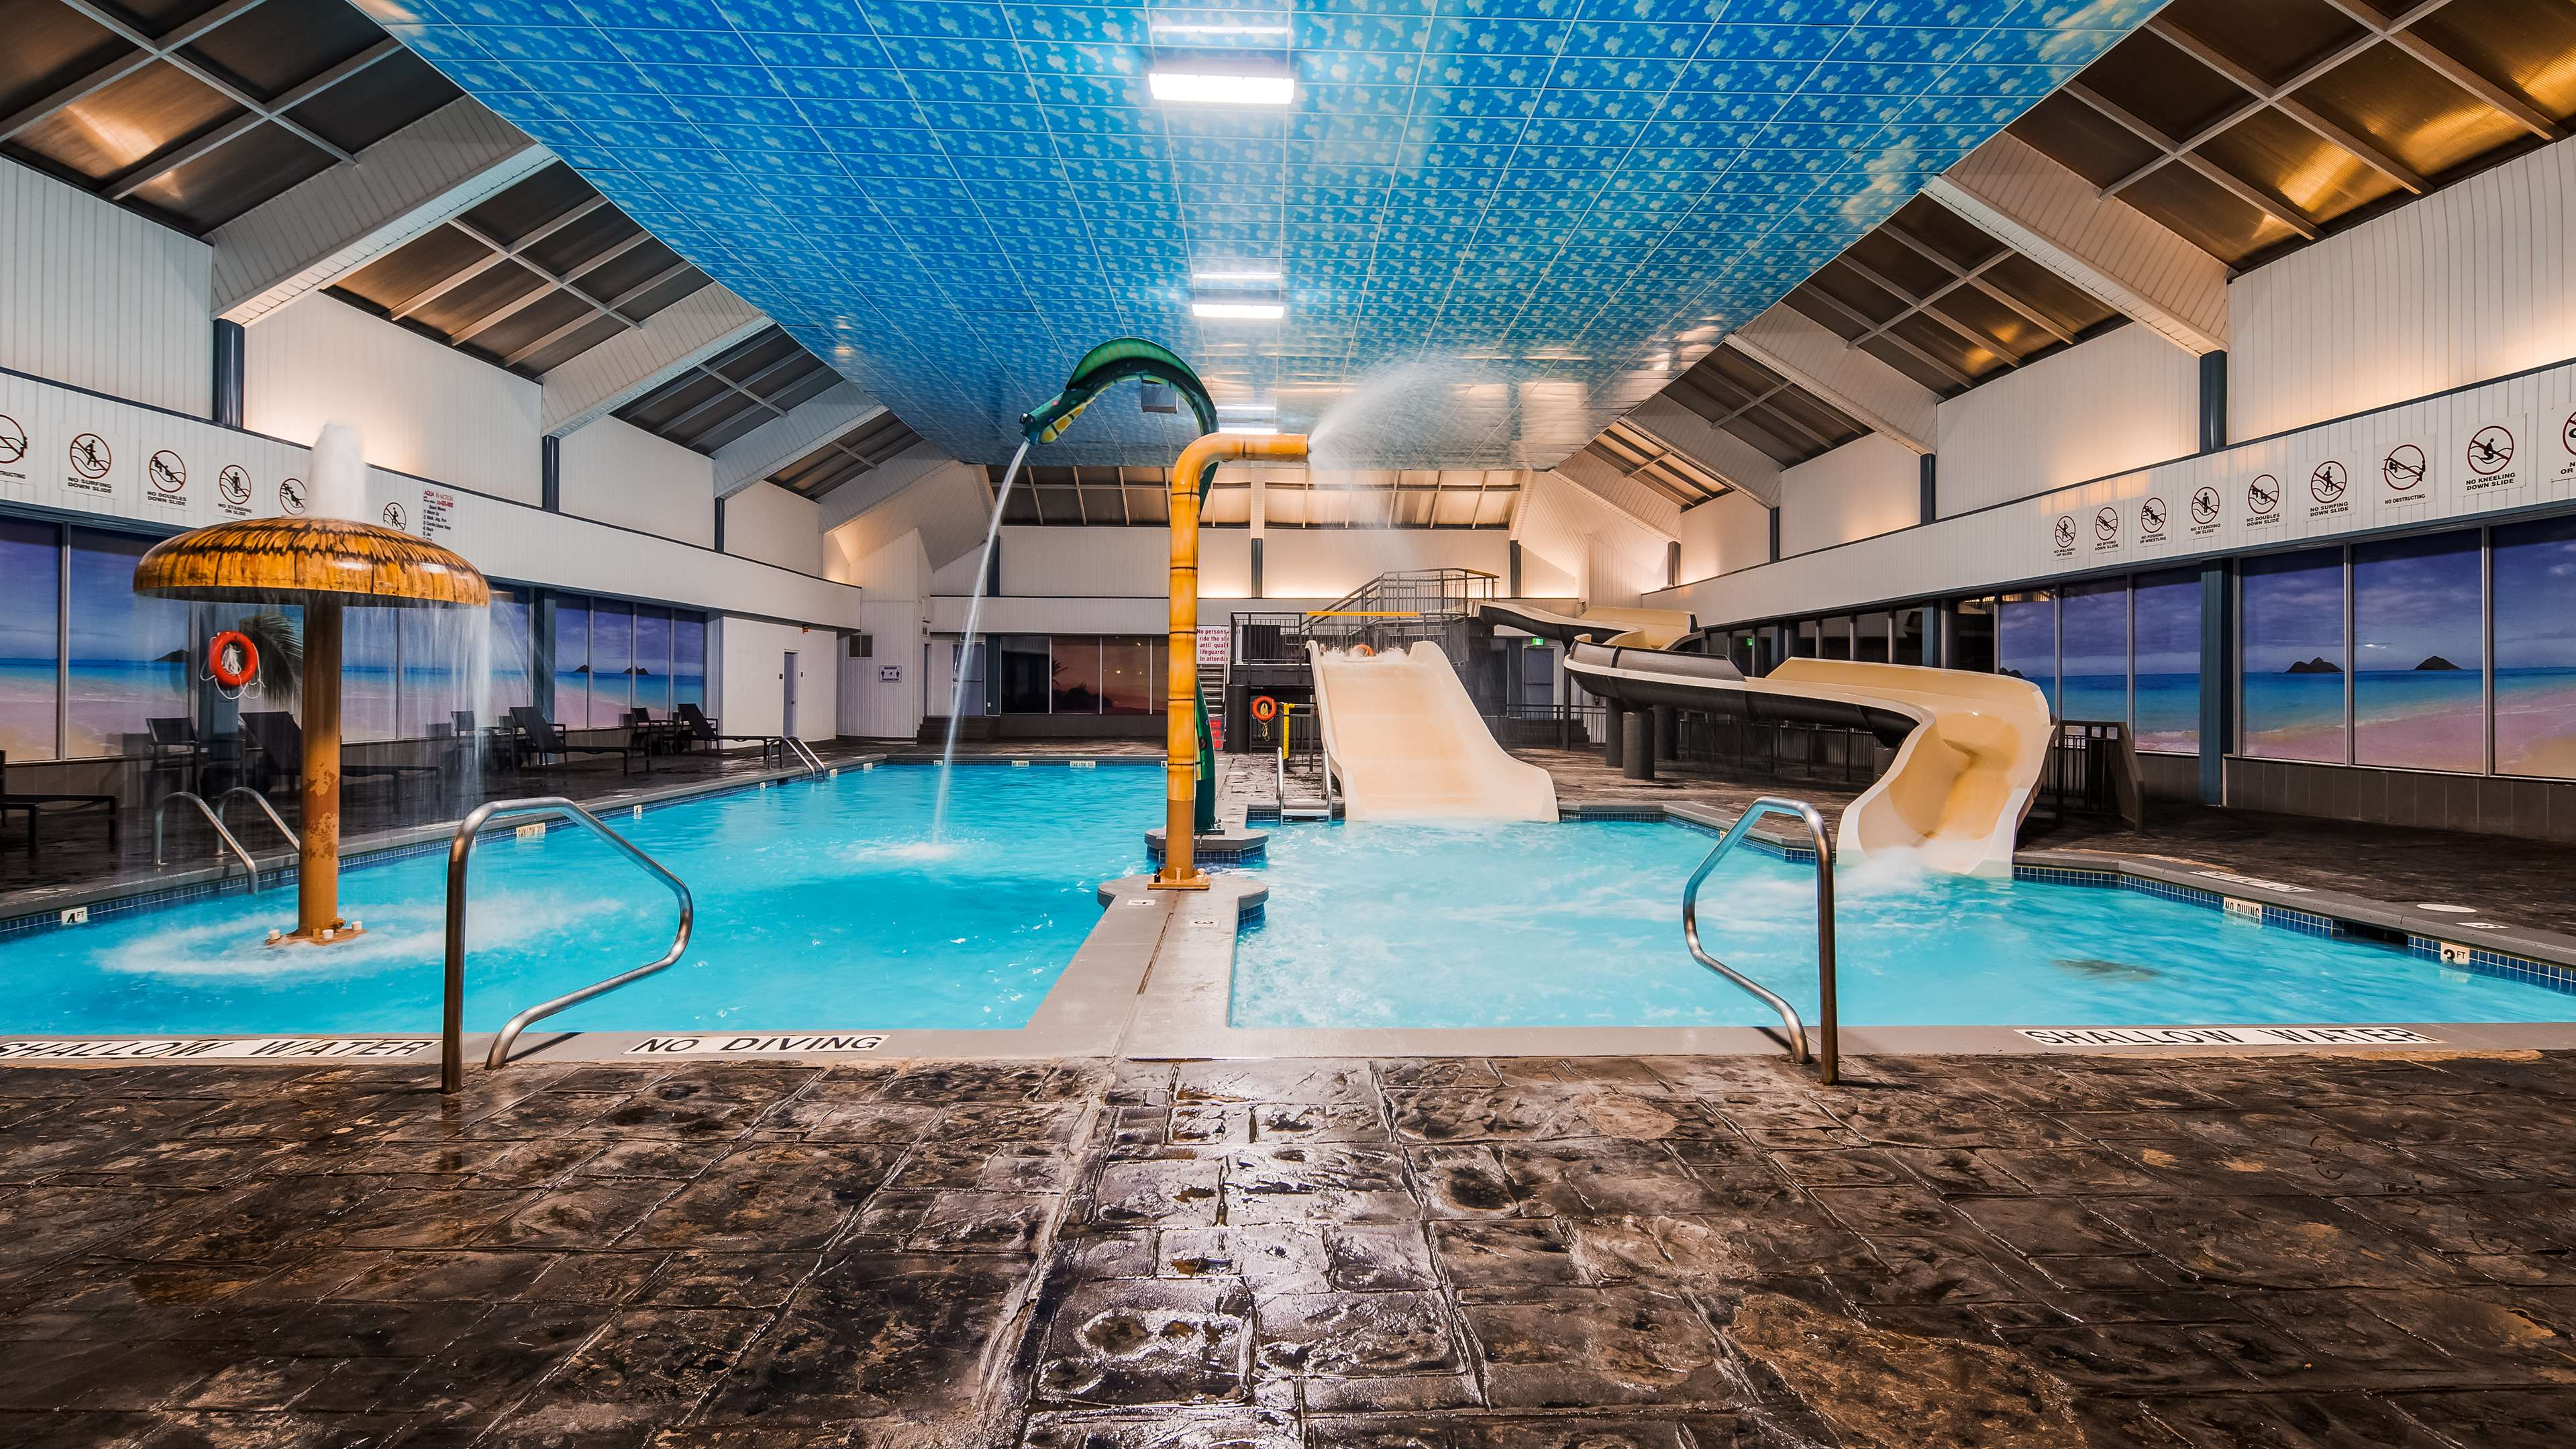 Indoor Pool Best Western Plus Leamington Hotel & Conference Centre Leamington (519)326-8646